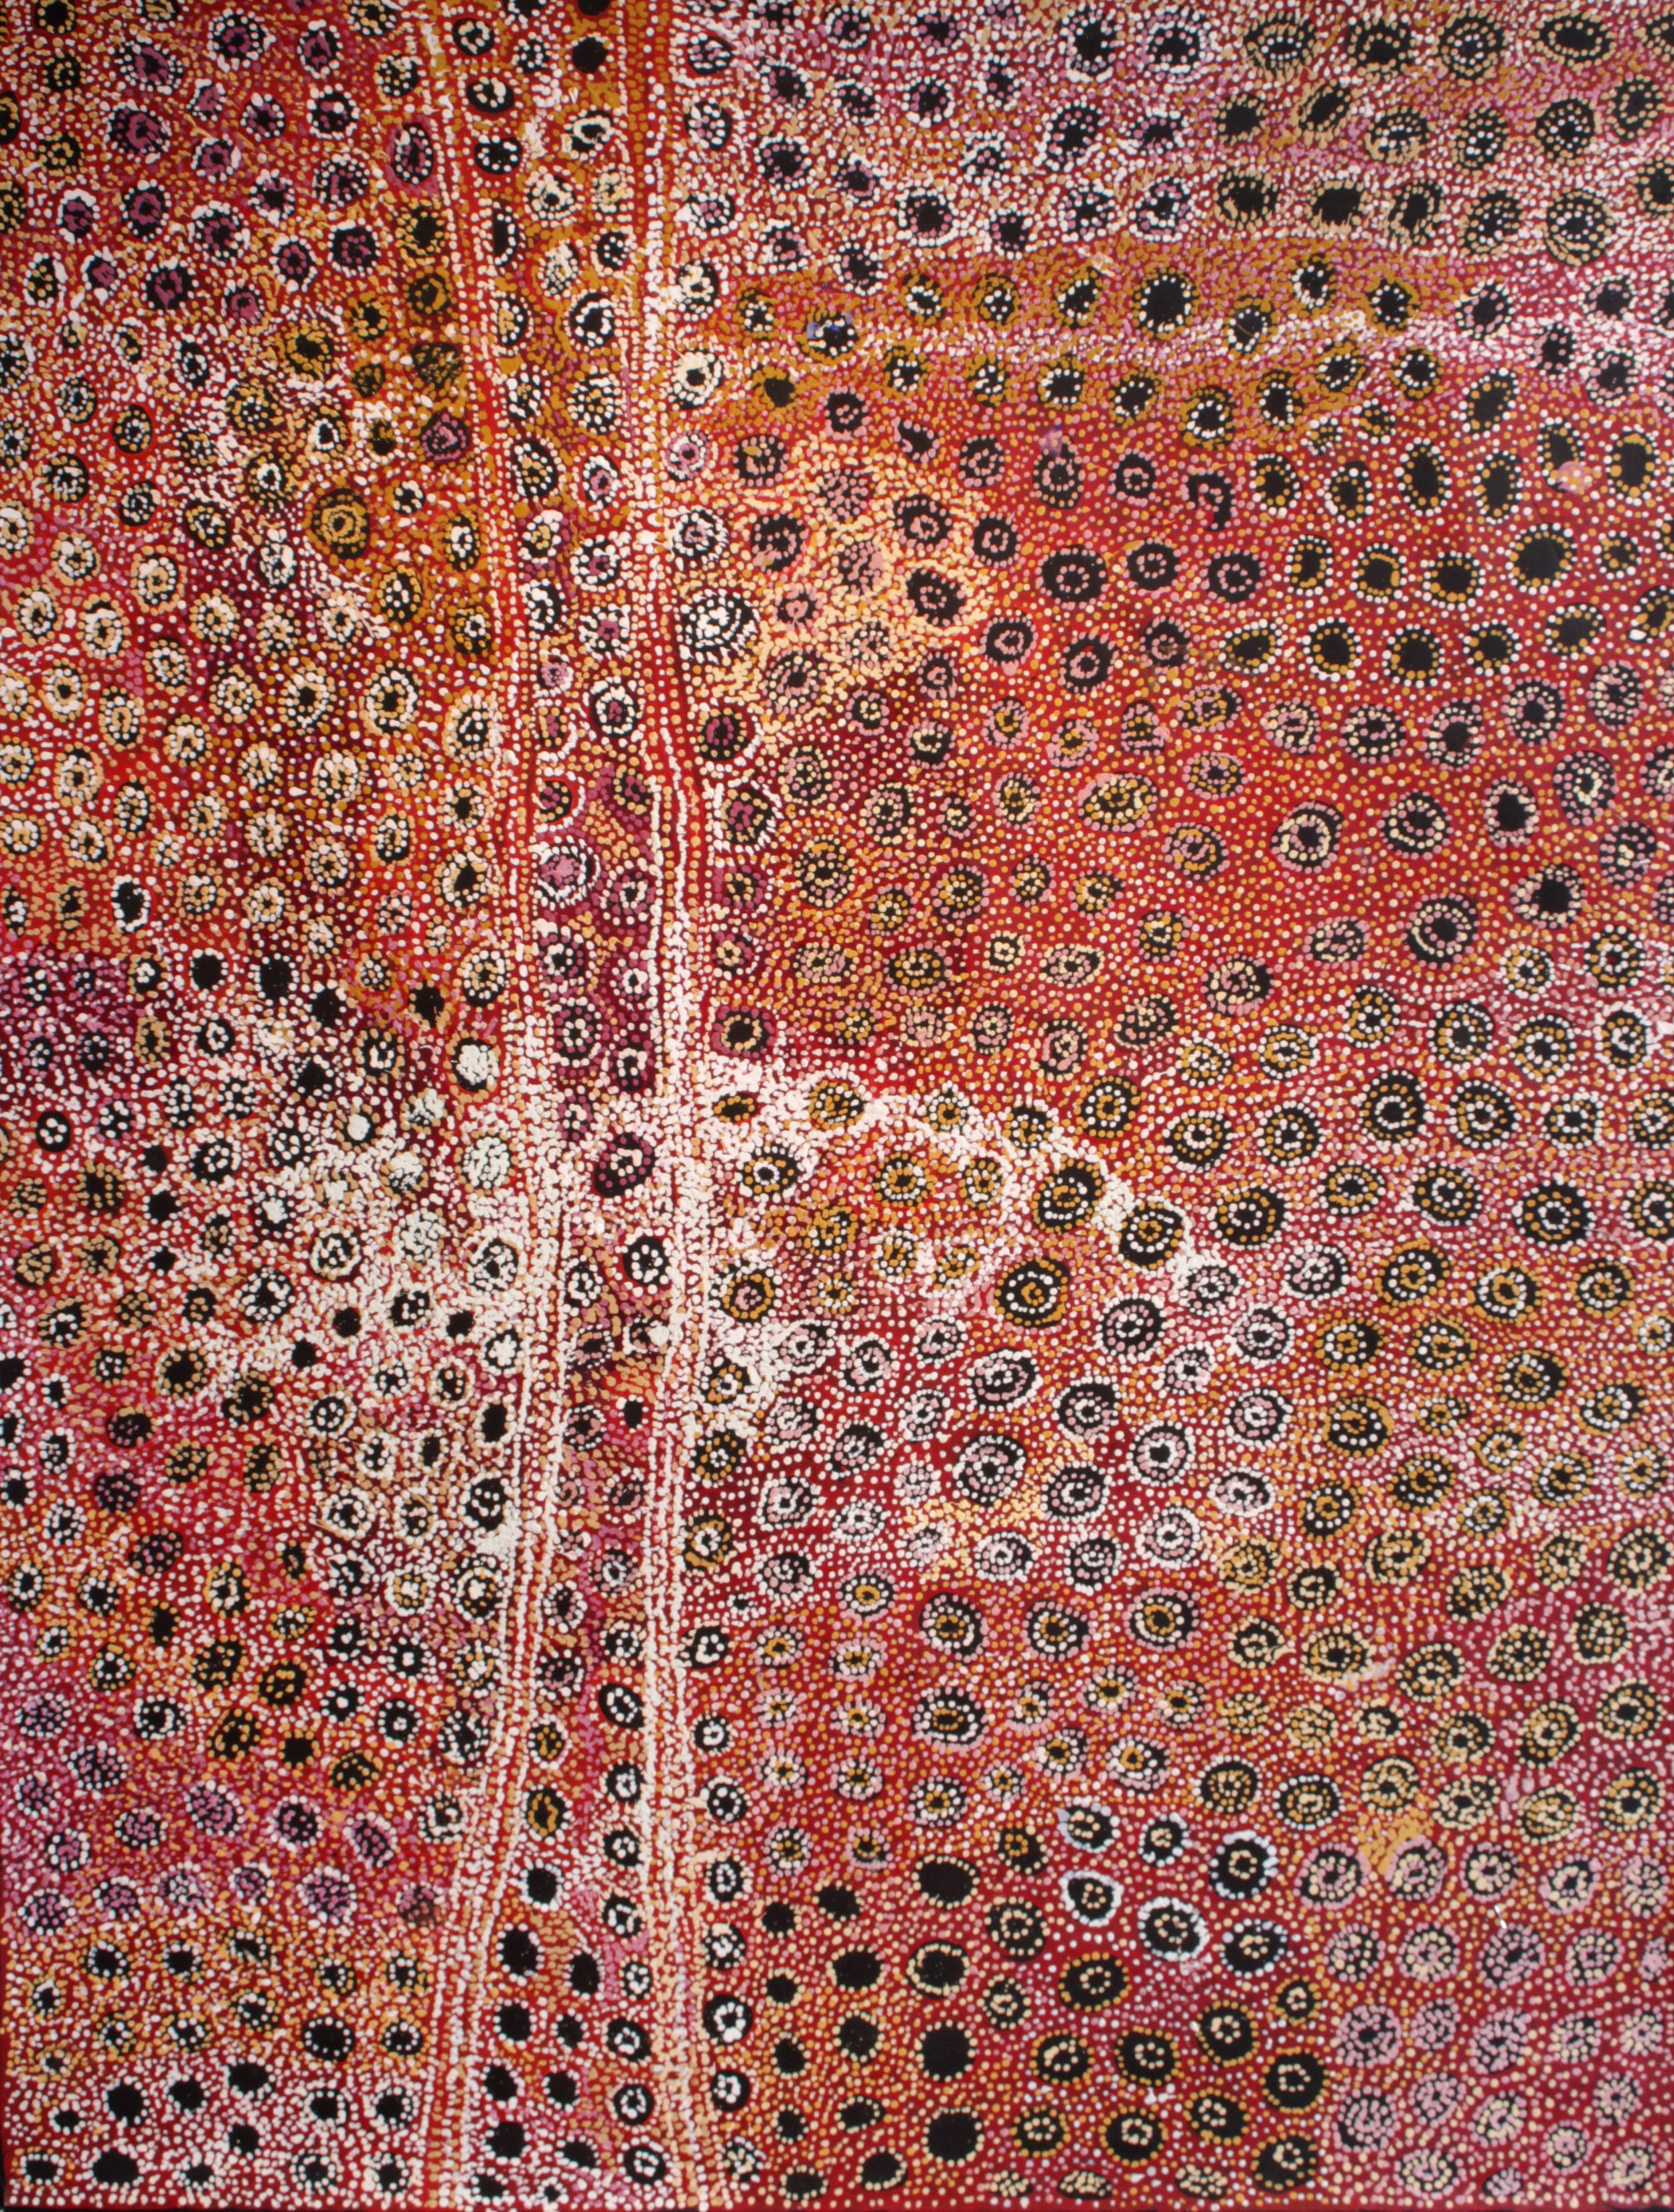 "Mona Mitakiki Shepherd  Kapi Tjukula Tjuta - Many Rock Holes  Acrylic on Belgian linen 78"" x 60"" (198 x 153 cm) Tjala Arts Catalog #831-16   EMAIL INQUIRY"